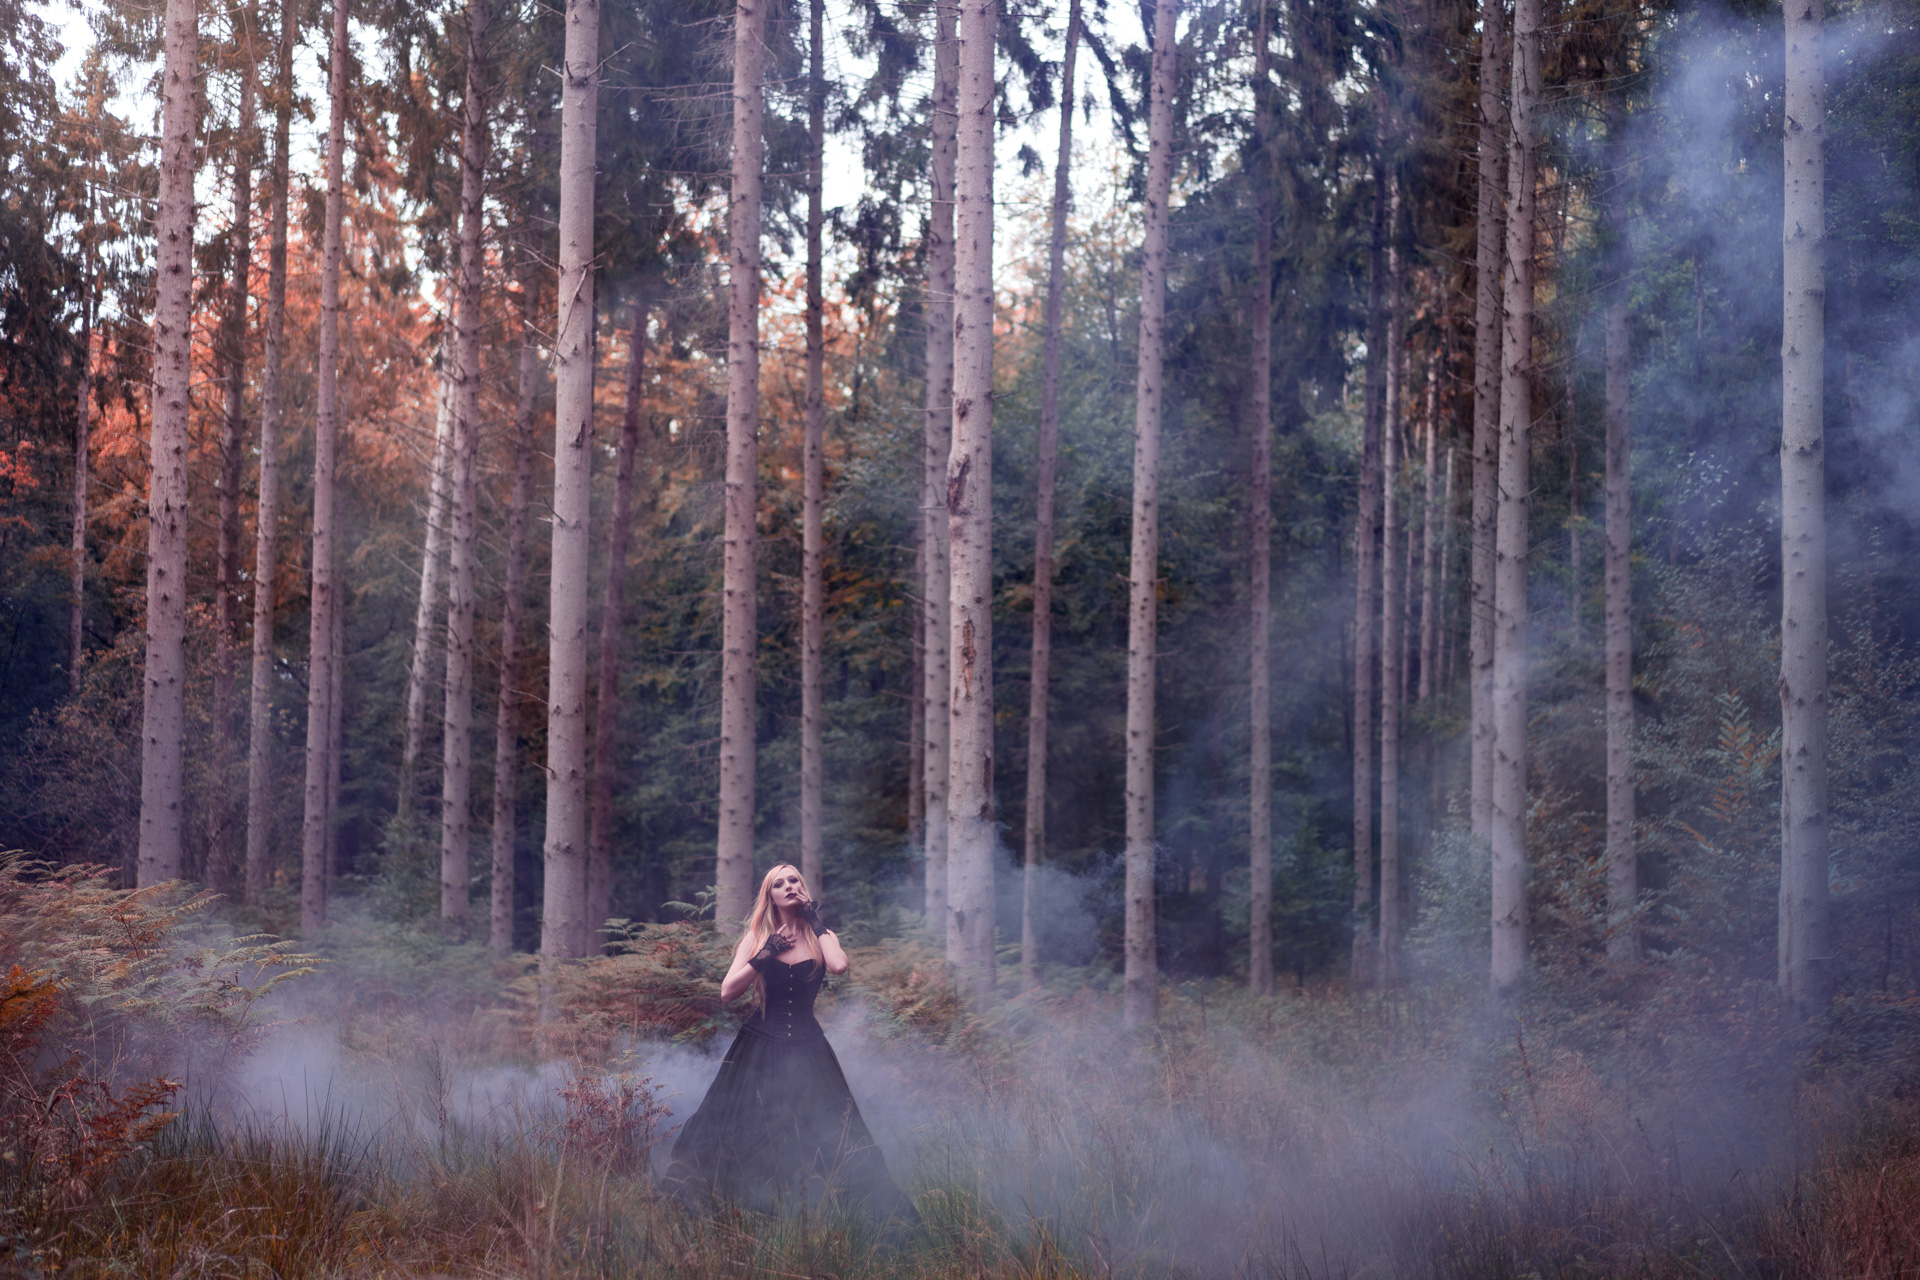 Demoiselle en noir perdue dans la brume